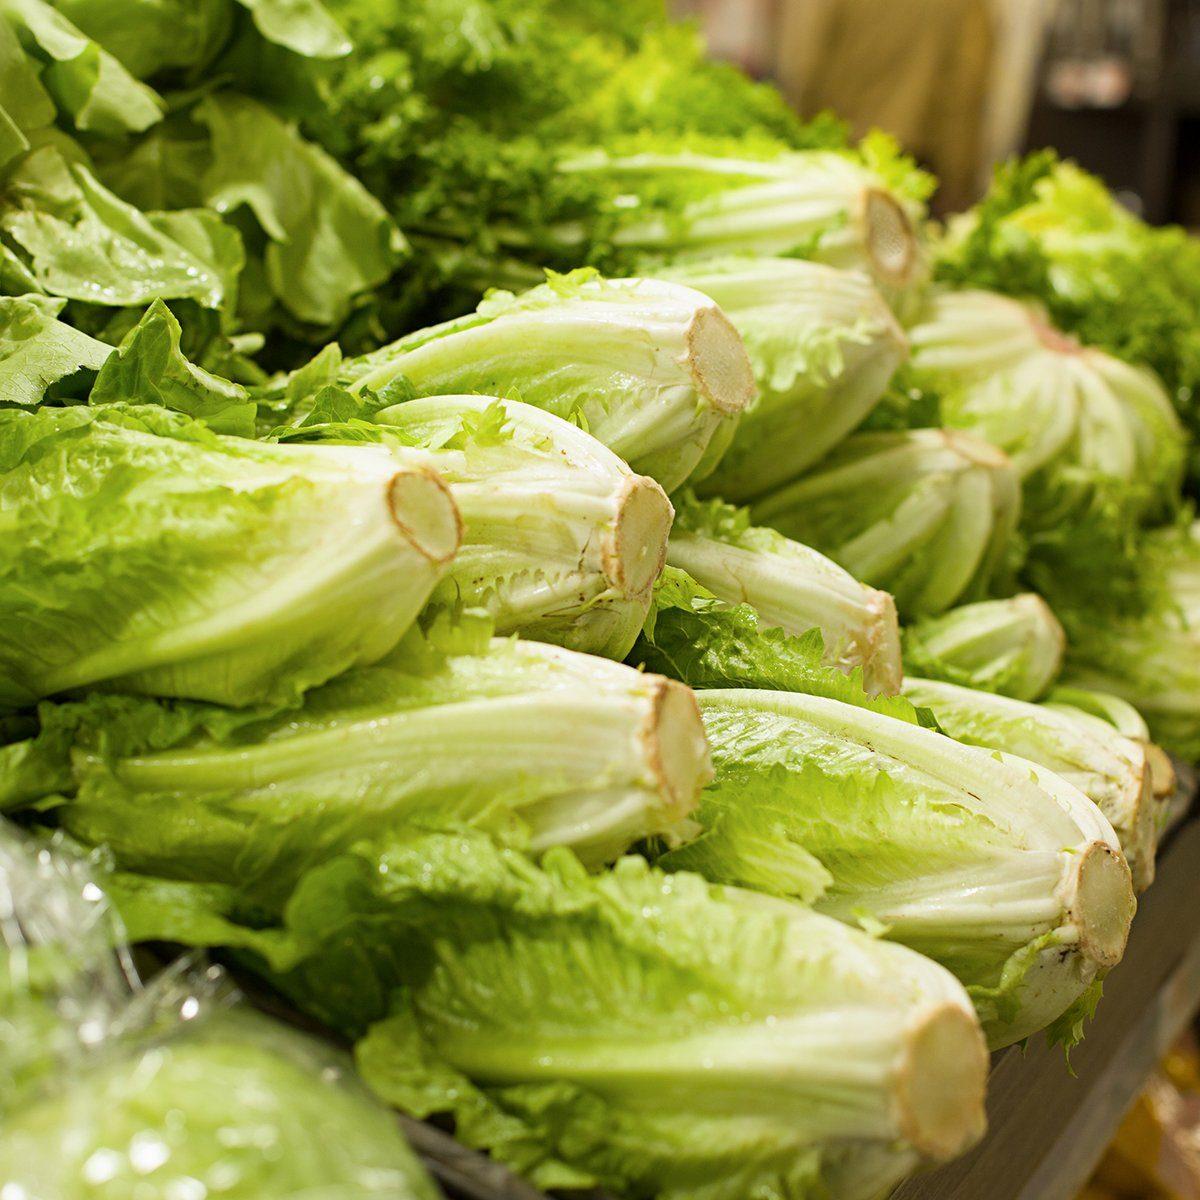 Fresh romaine lettuce in supermarket. Concept of healthy food, bio, vegetarian, diet.